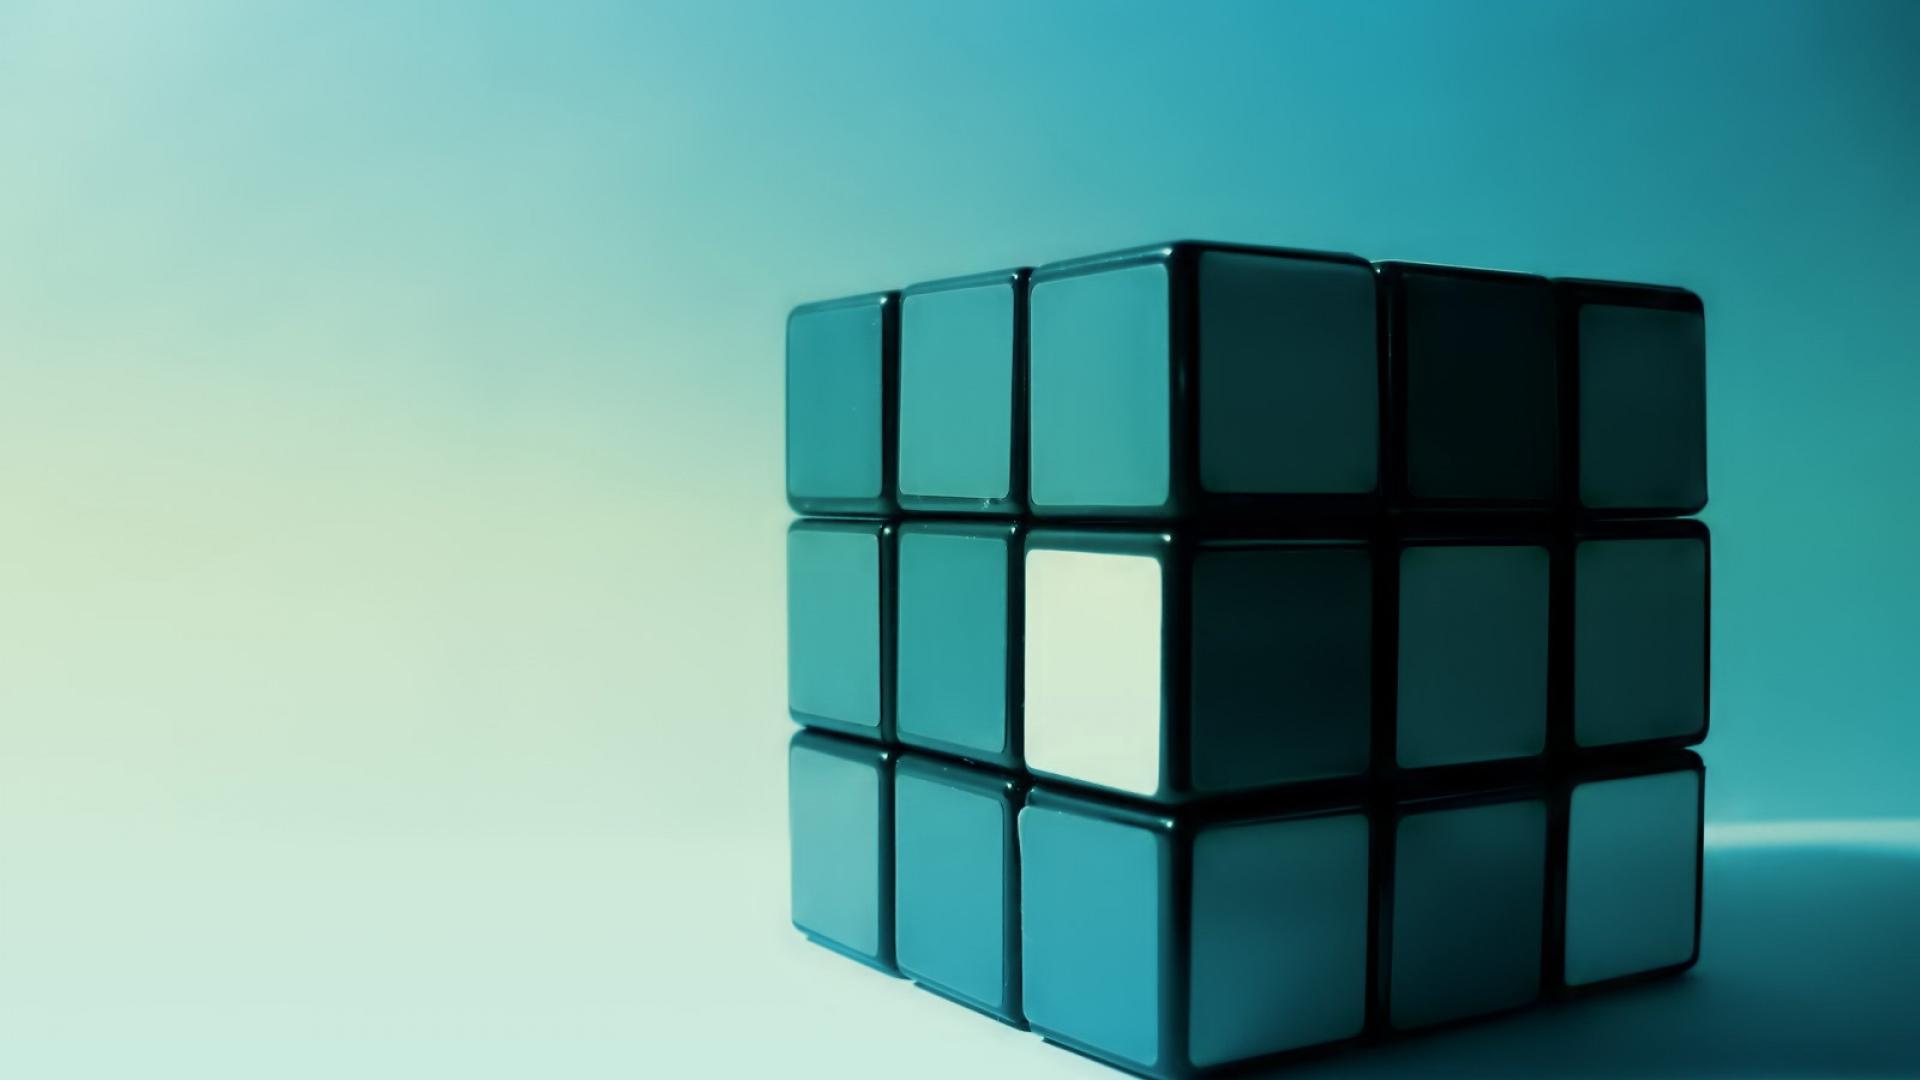 download wallpaper 1920x1080 rubiks cube, cube, shape, surface full